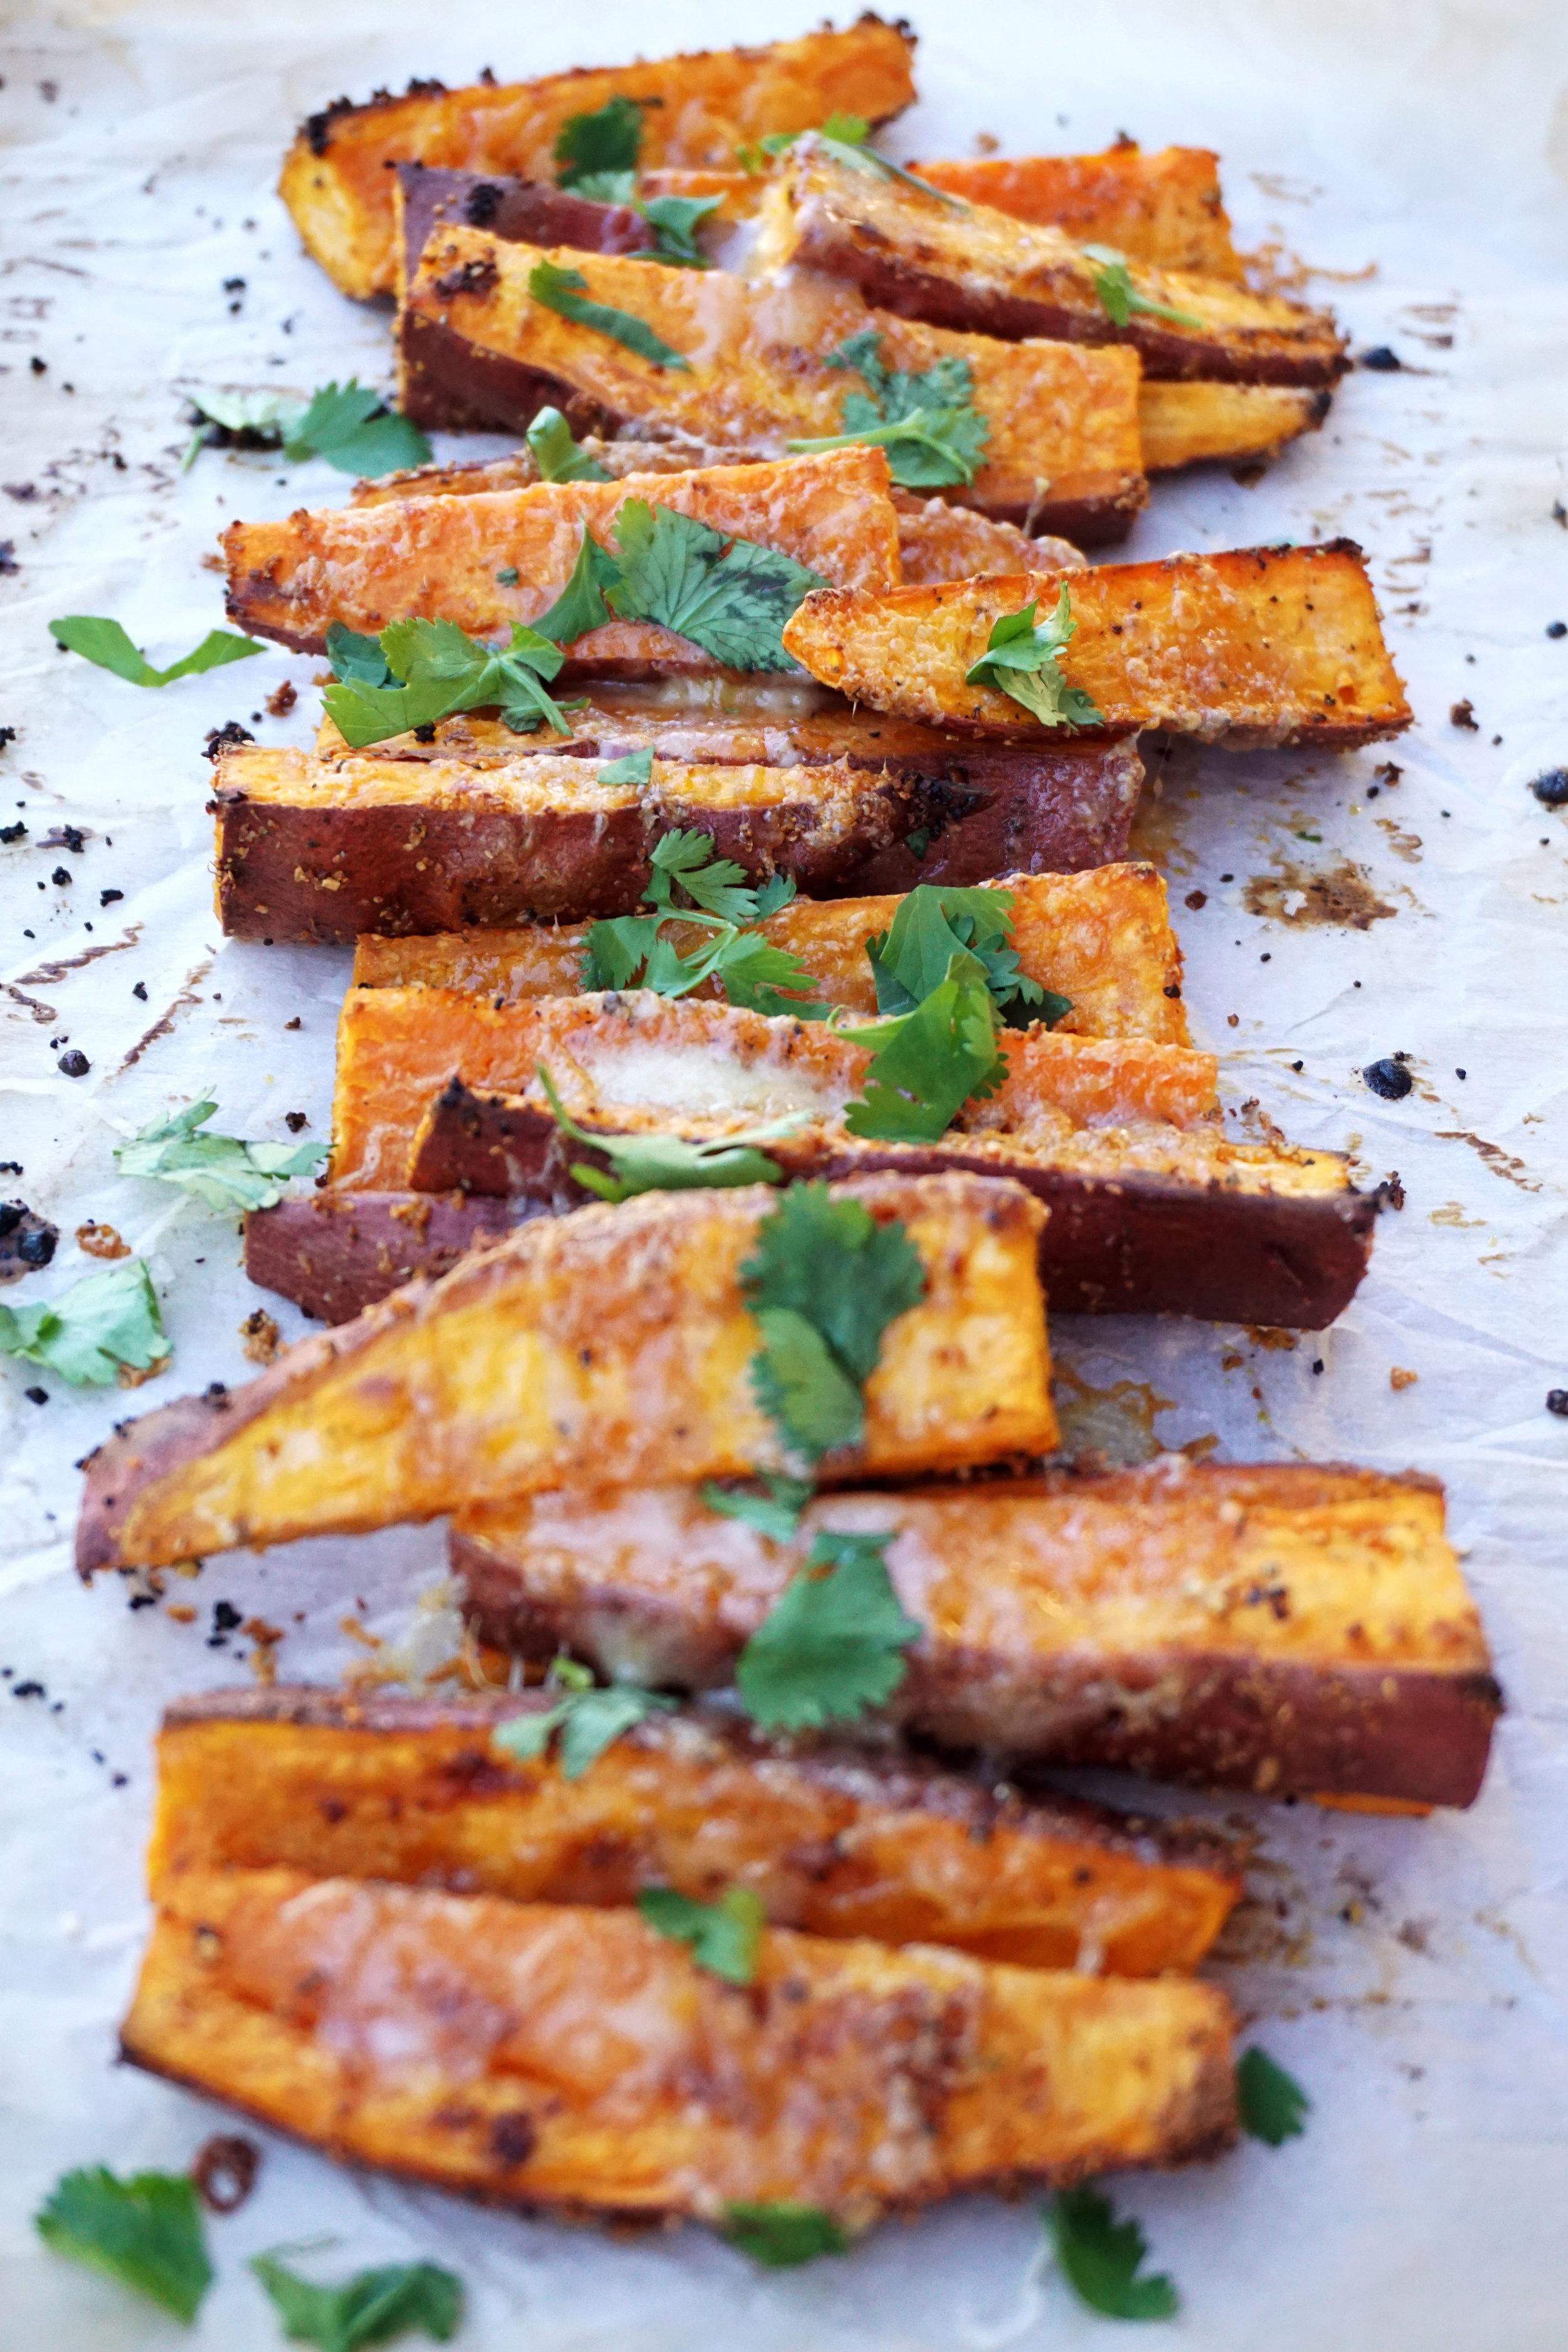 Roasted Garlic White Cheddar Sweet Potato Wedges (GF)